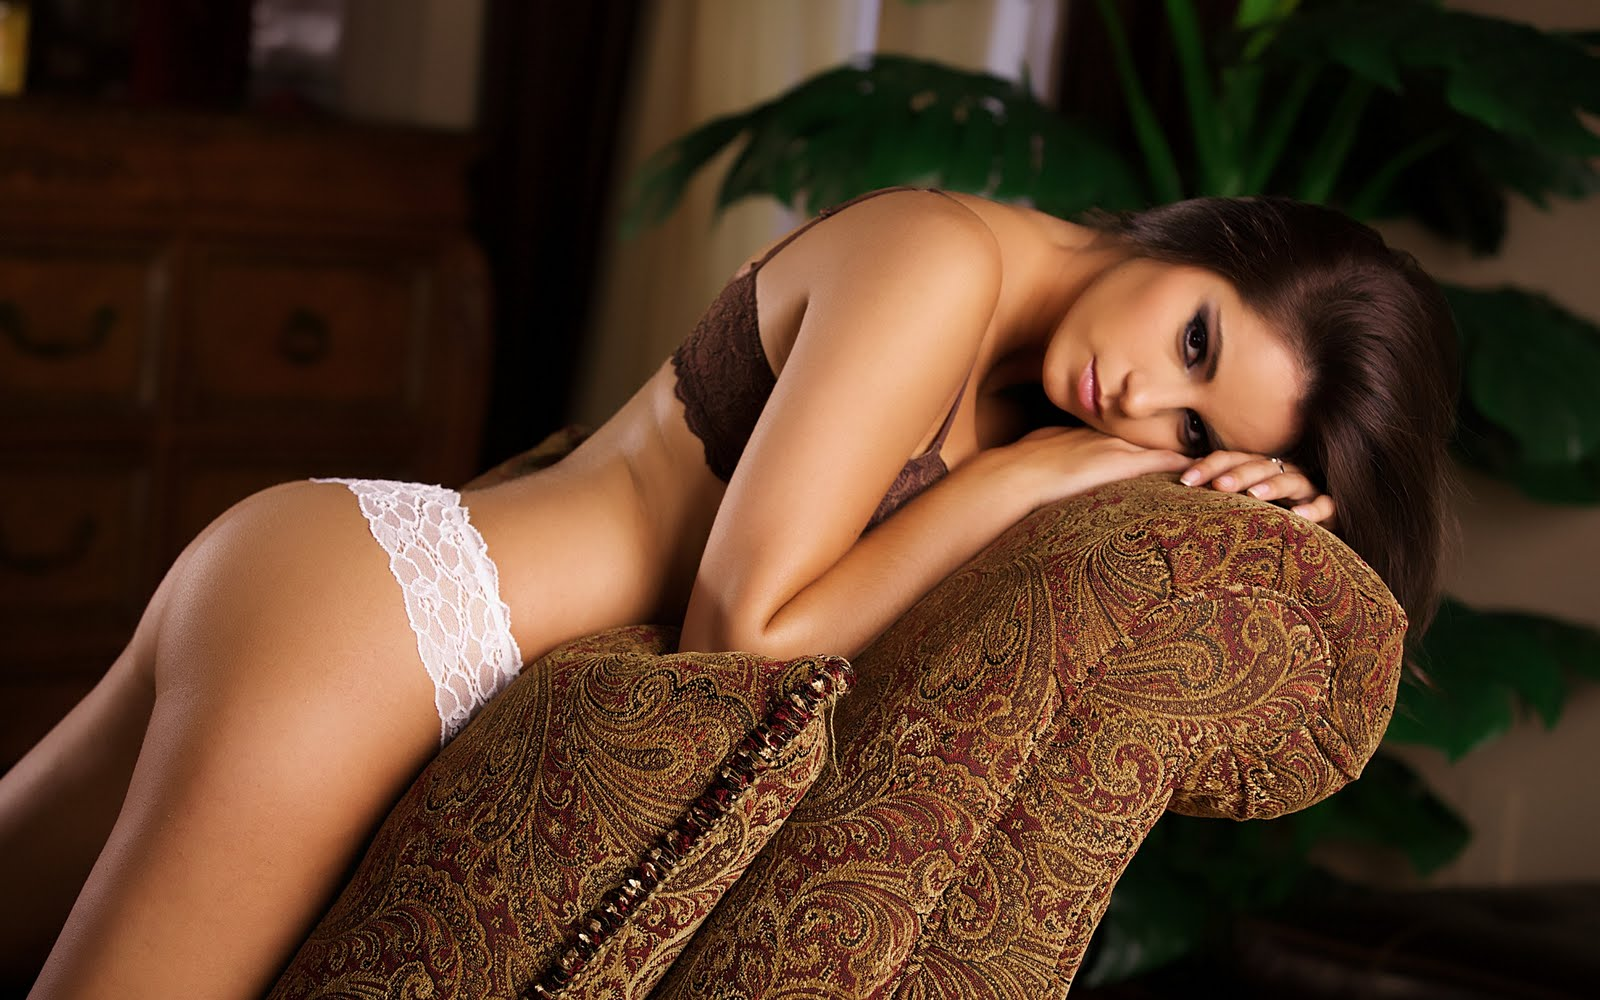 http://1.bp.blogspot.com/-TAZggEhQj1U/Tm6JsDOfV0I/AAAAAAAAB7k/Bn_6g_X26V4/s1600/Wallpapers+Chicas+Hermosas+HD+%25284%2529.jpg